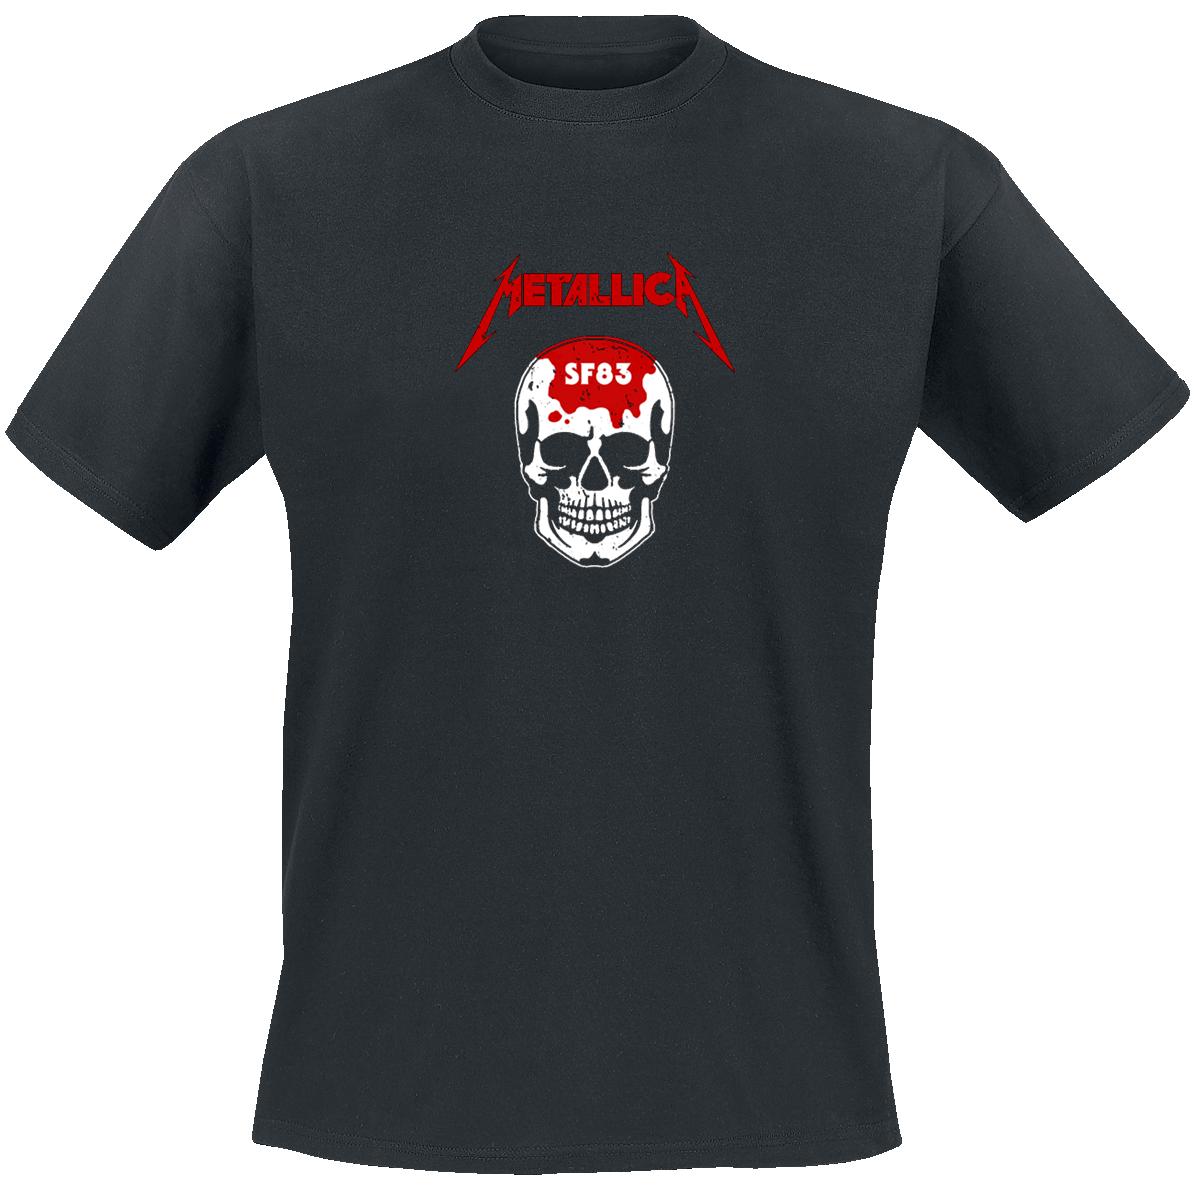 Metallica - Kill 'Em All - Skull - T-Shirt - black image